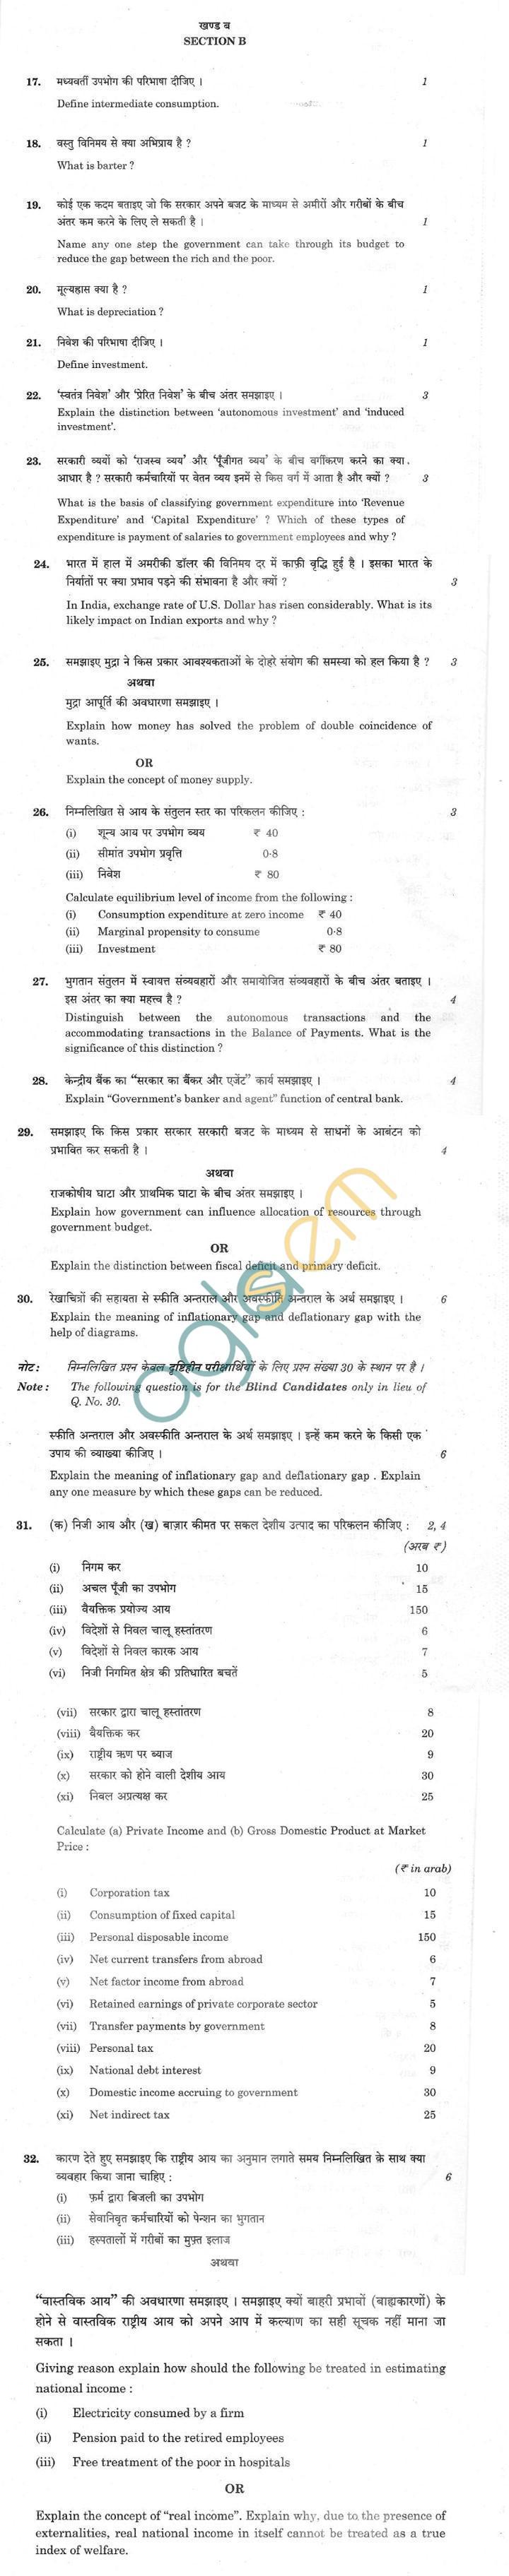 CBSE Board Exam 2014 Class 12 Sample Question Paper - Economics